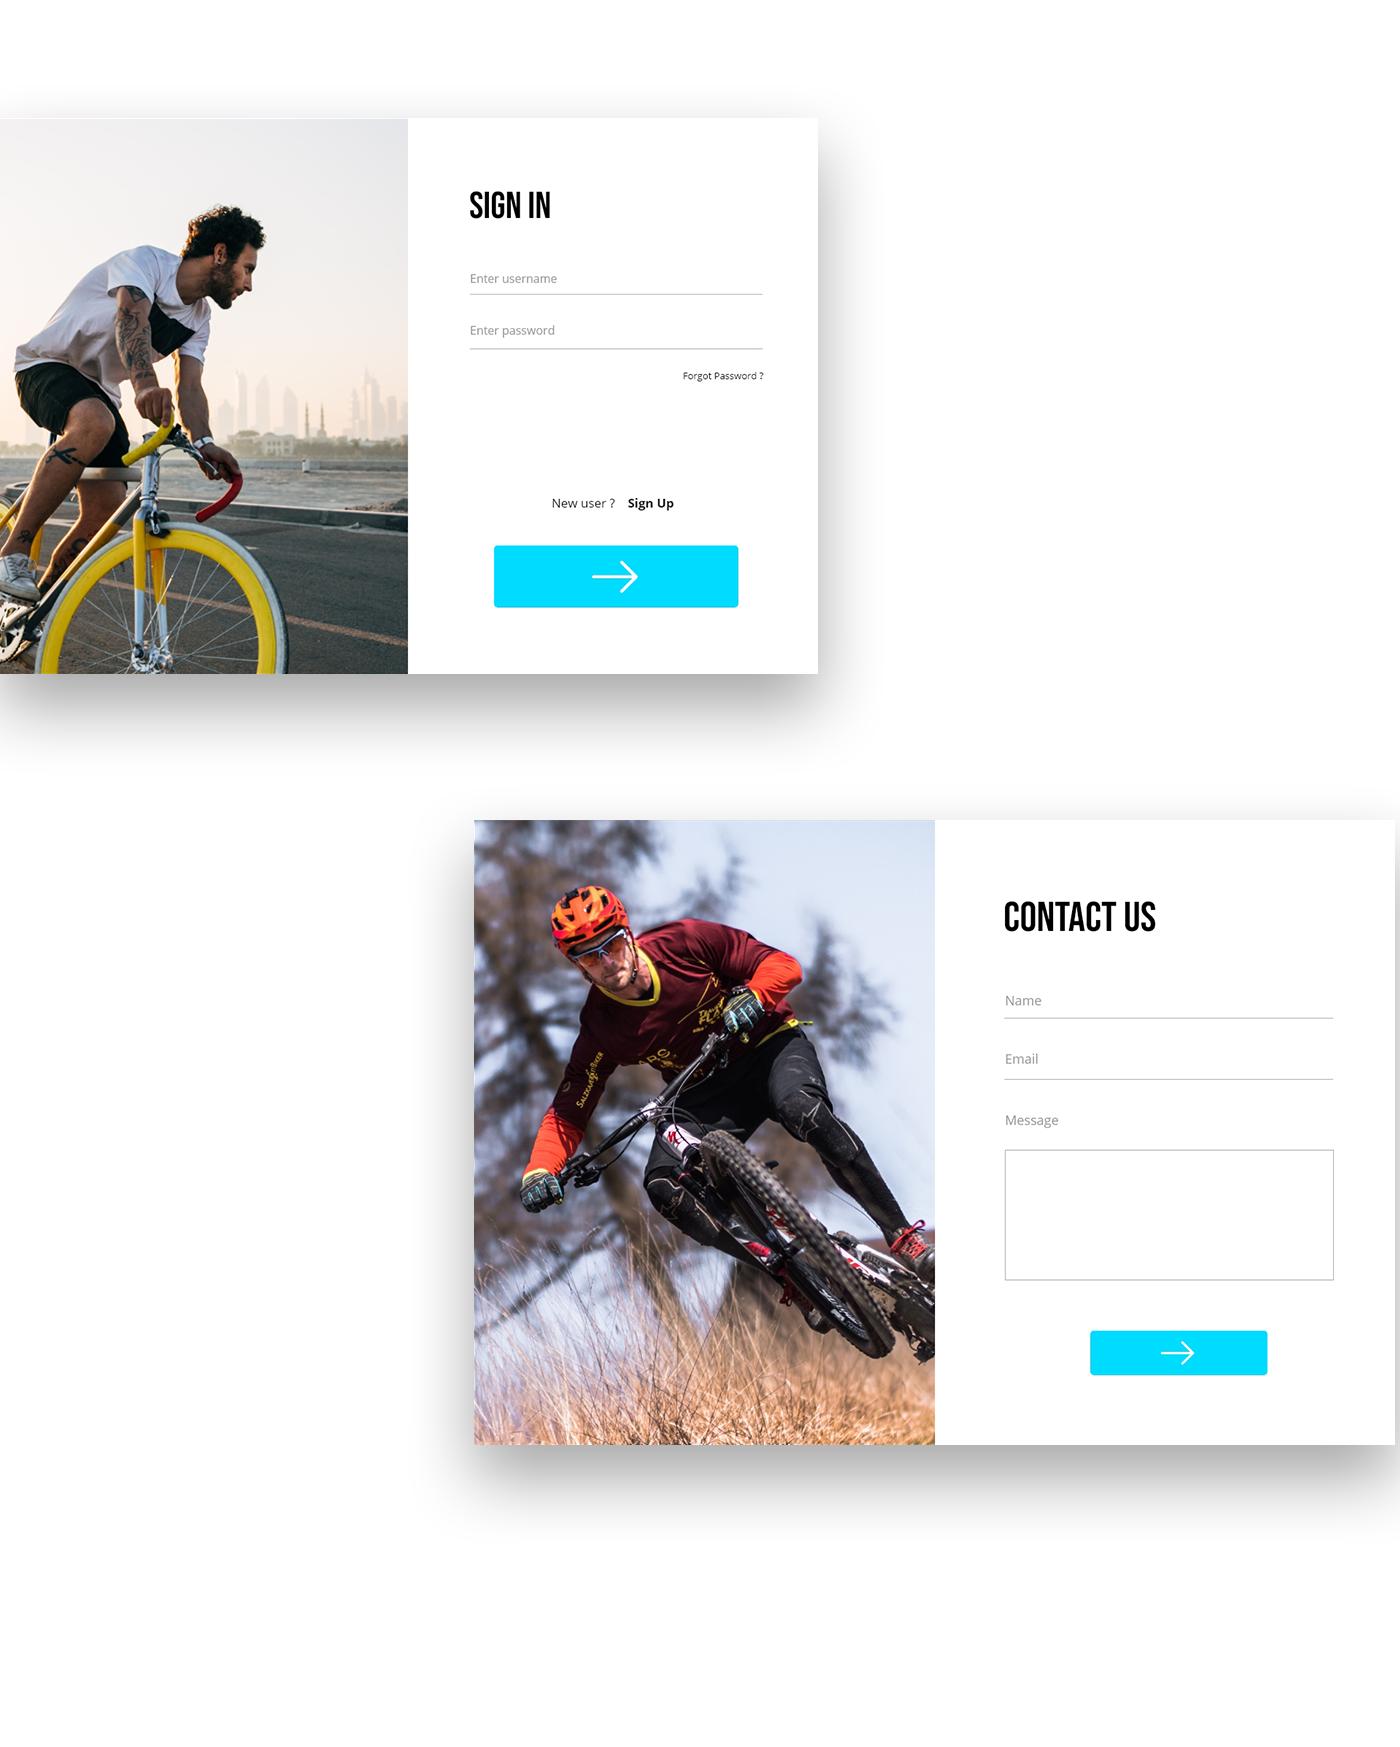 adobexd Bicycle bikes UI uidesign ux uxdesign Webdesign Website websitedesign